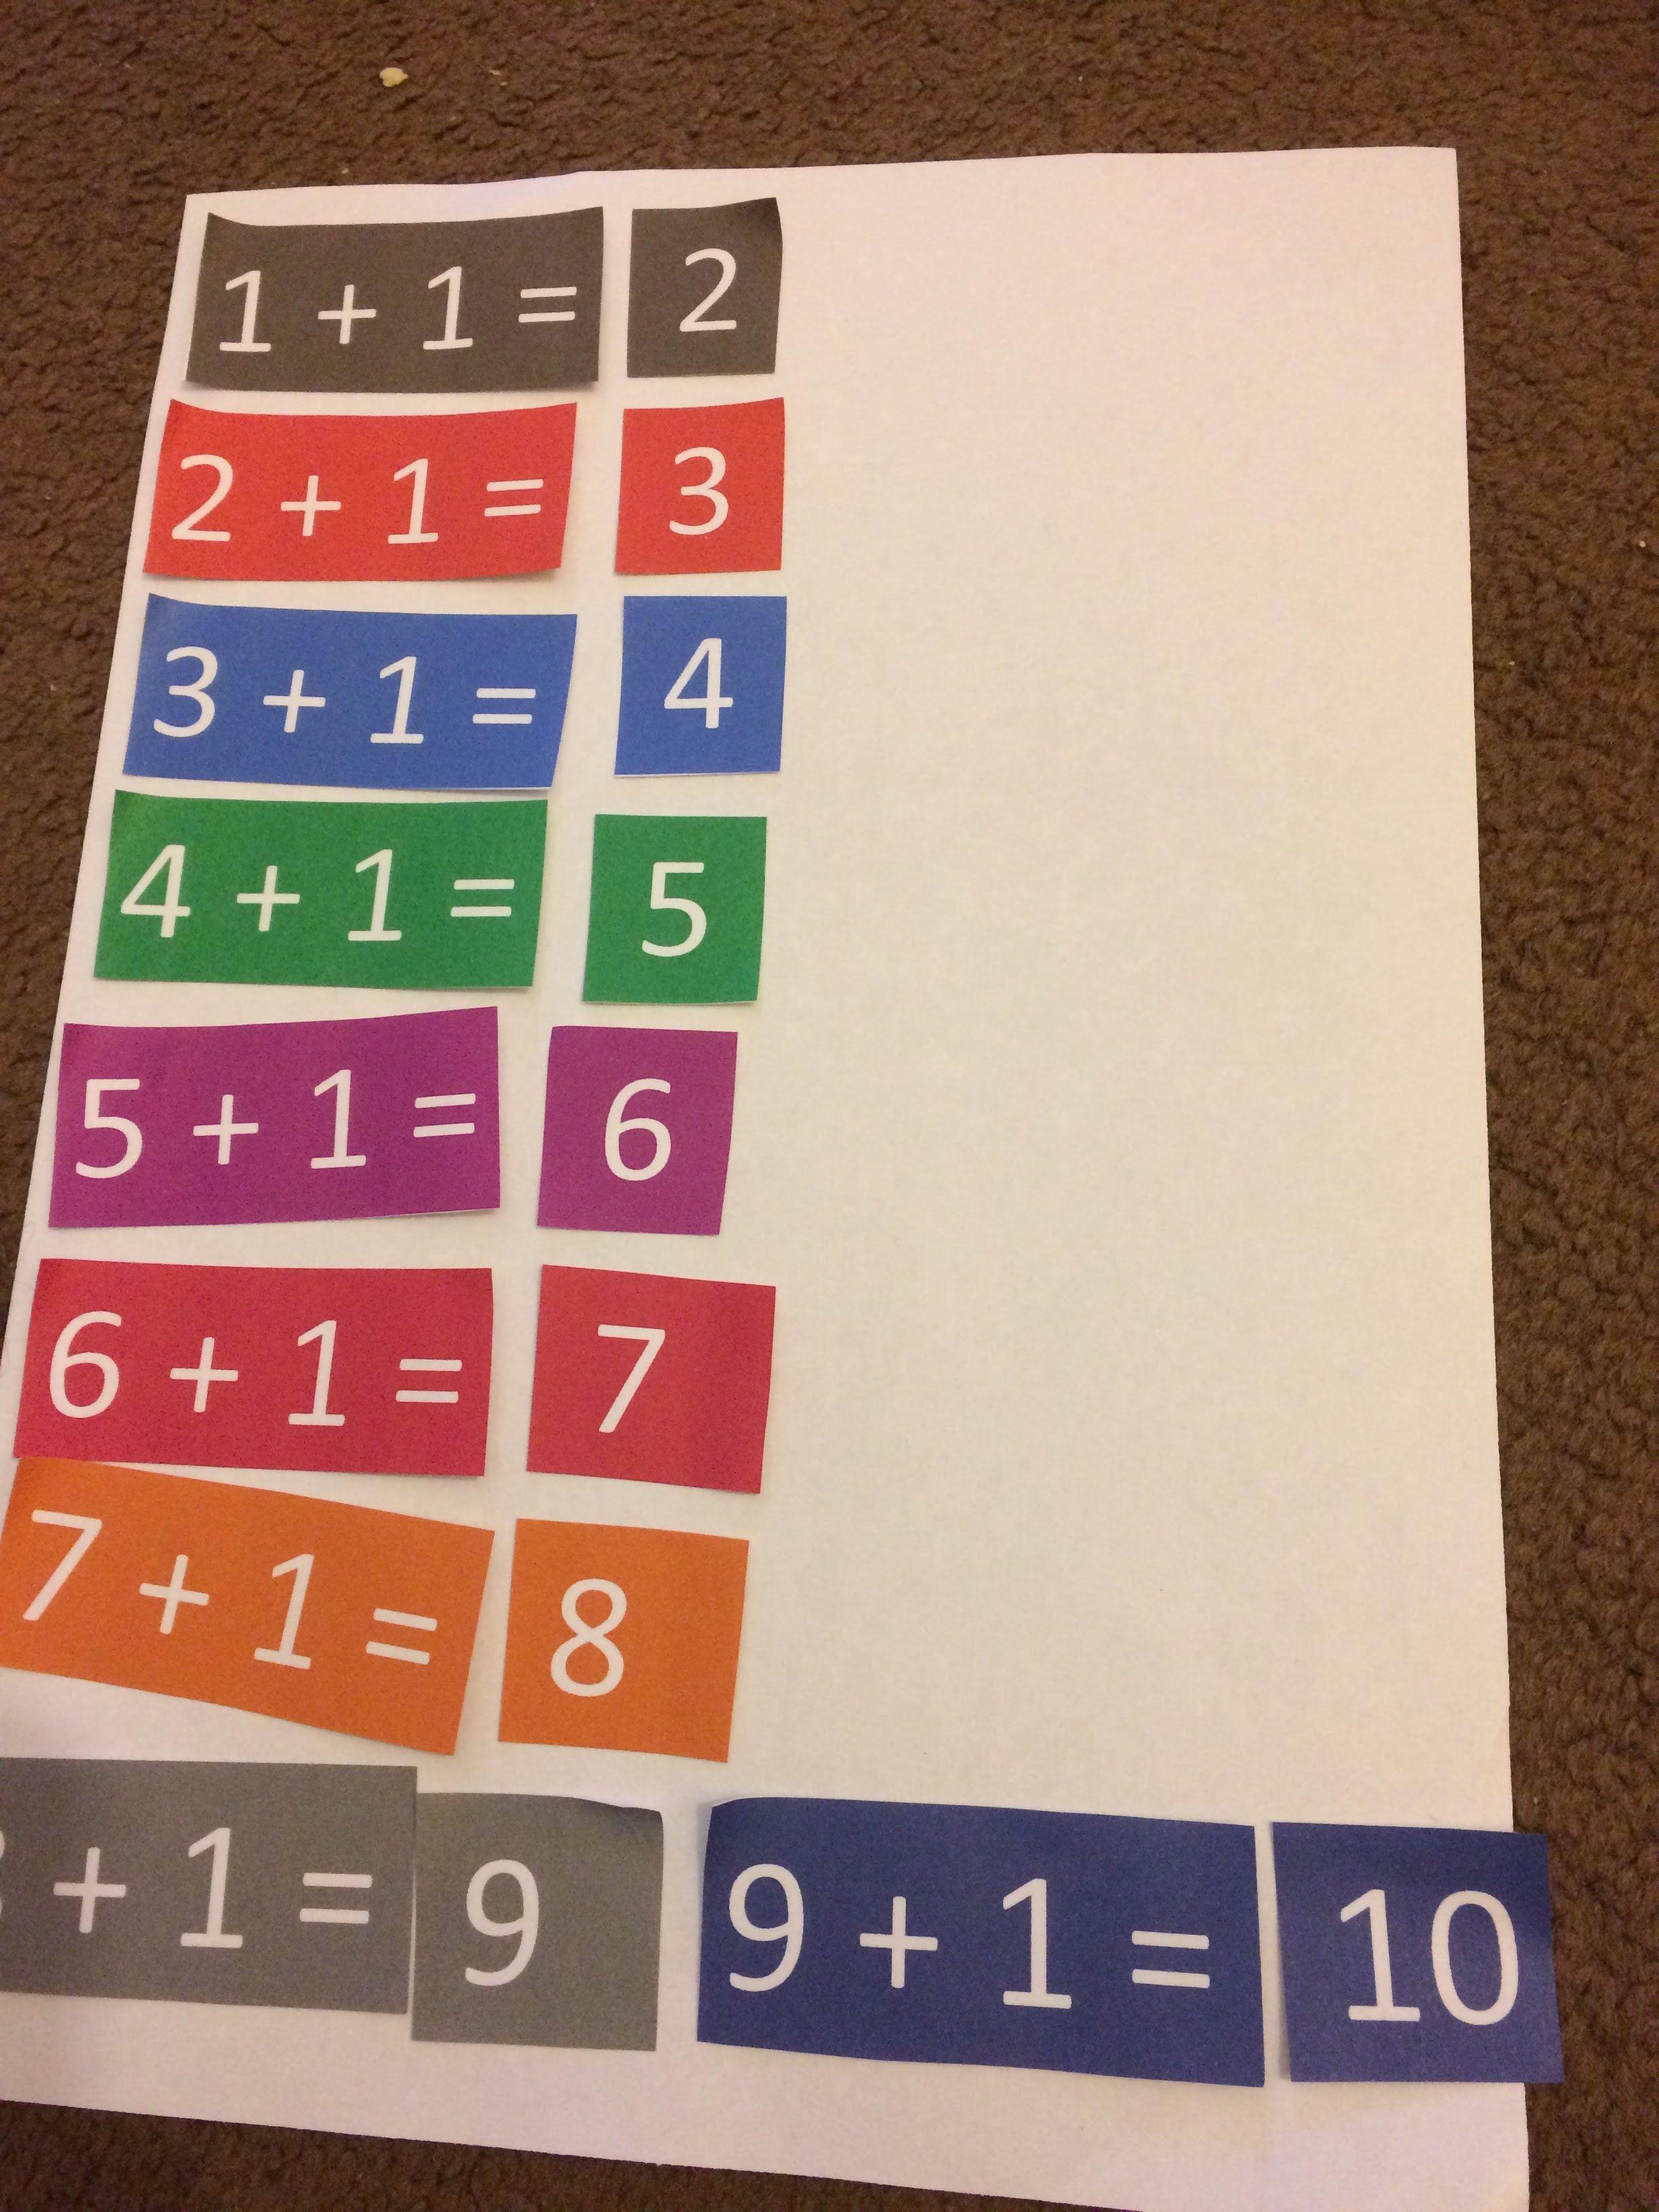 Errorless Number Sentences 1 9 Plus 1 Maths Sen Down